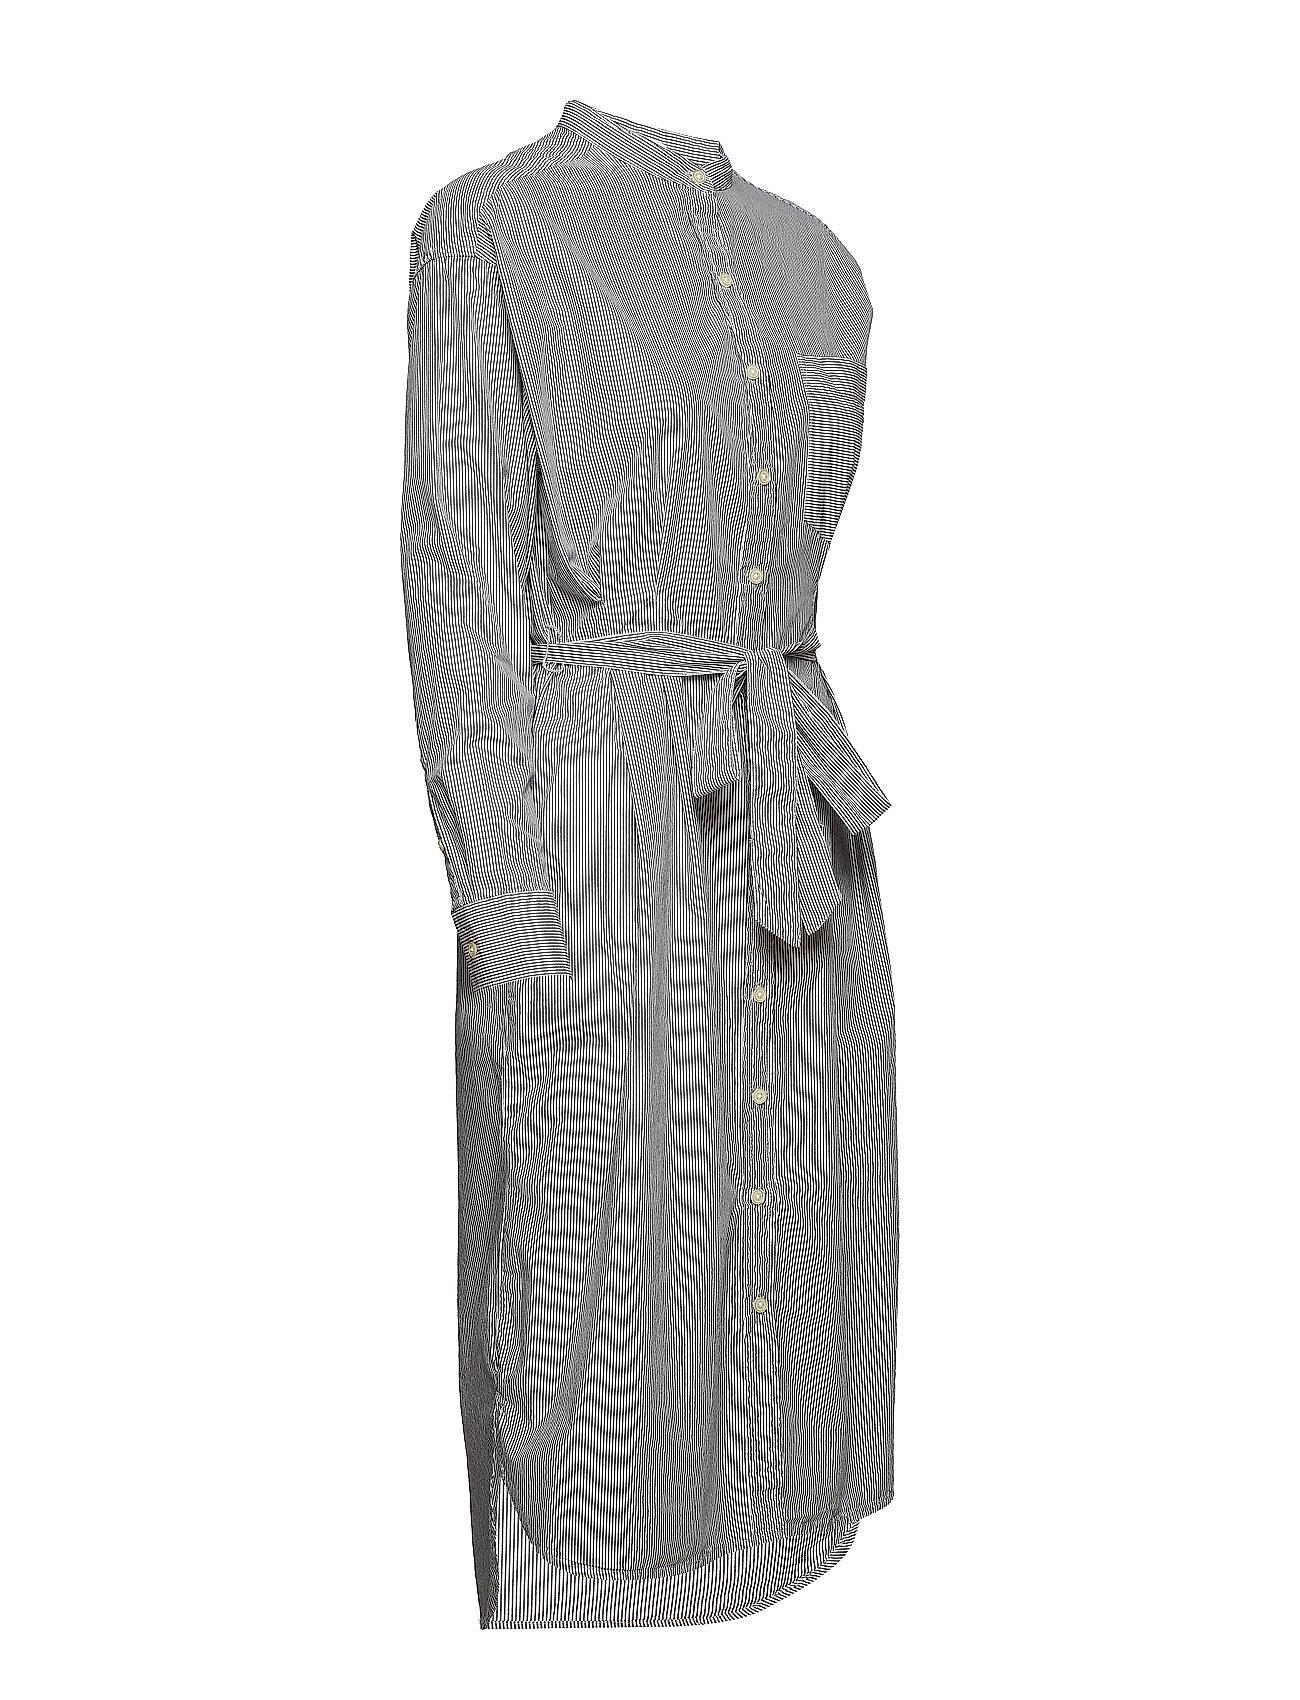 GAP    Perfect Long Sleeve Tie-Belt Shirtdress  - Kleider    BLACK/WHITE STRP - J